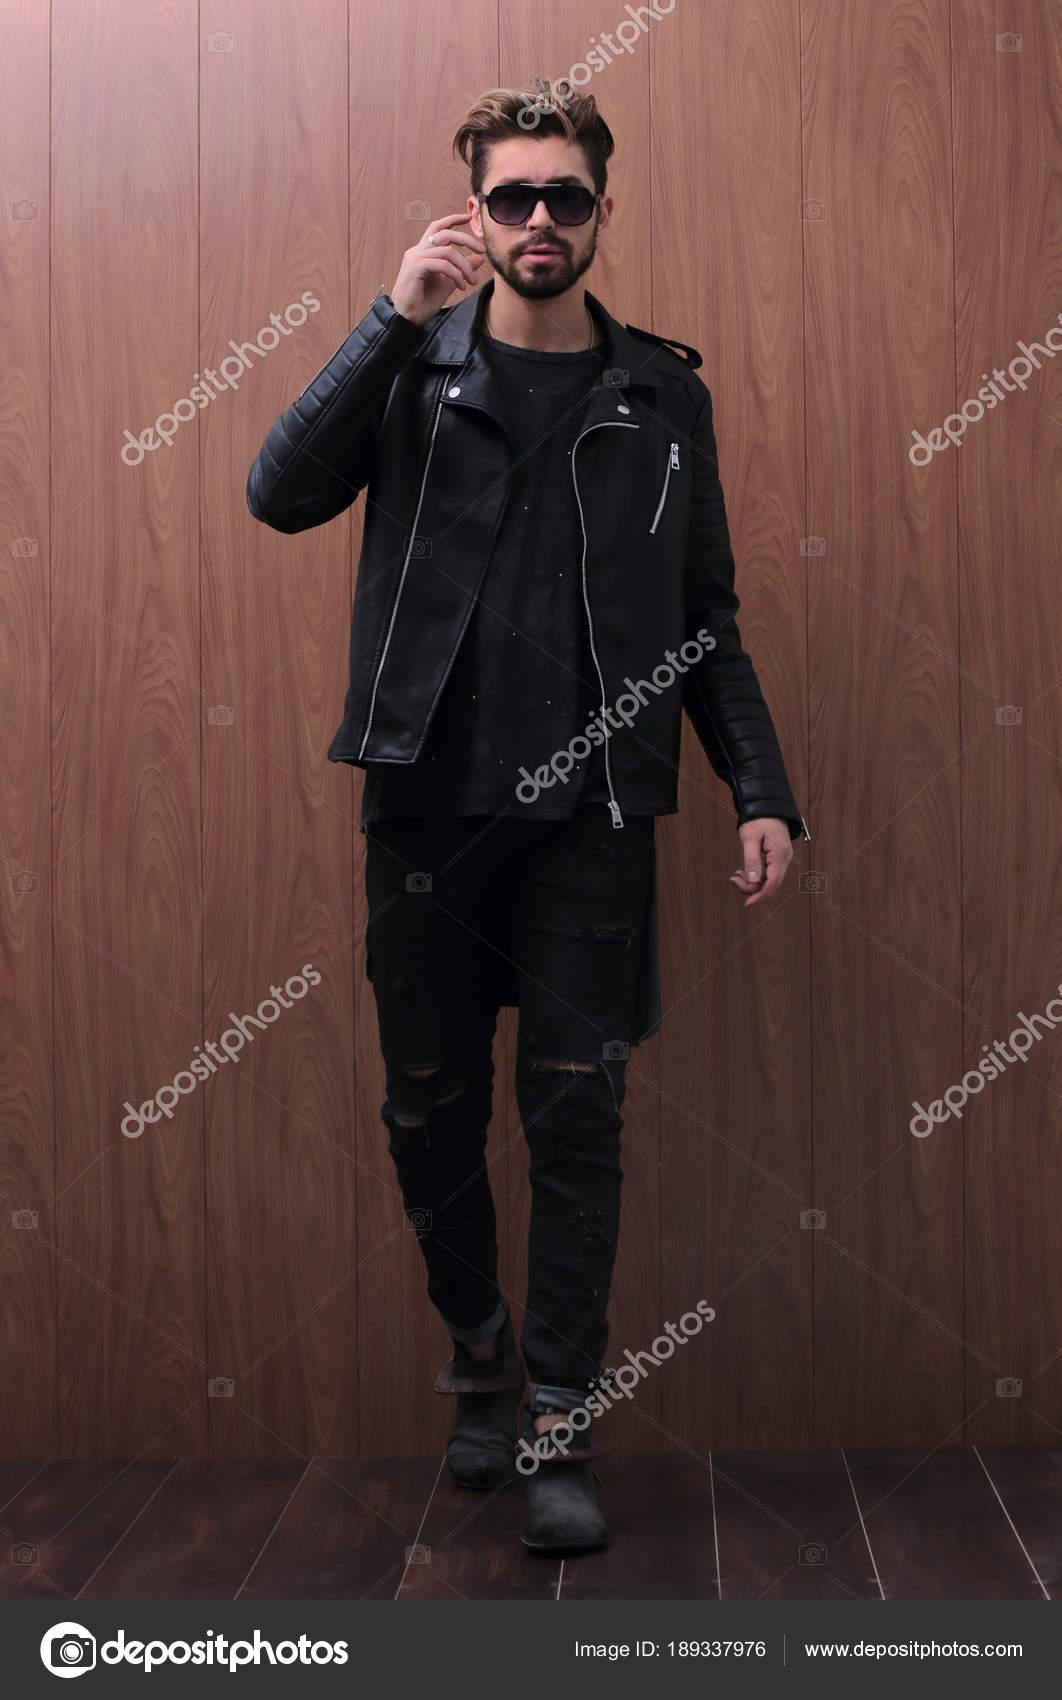 separation shoes ab05f 227b8 Un uomo è in piedi in una giacca di pelle nera e jeans ...